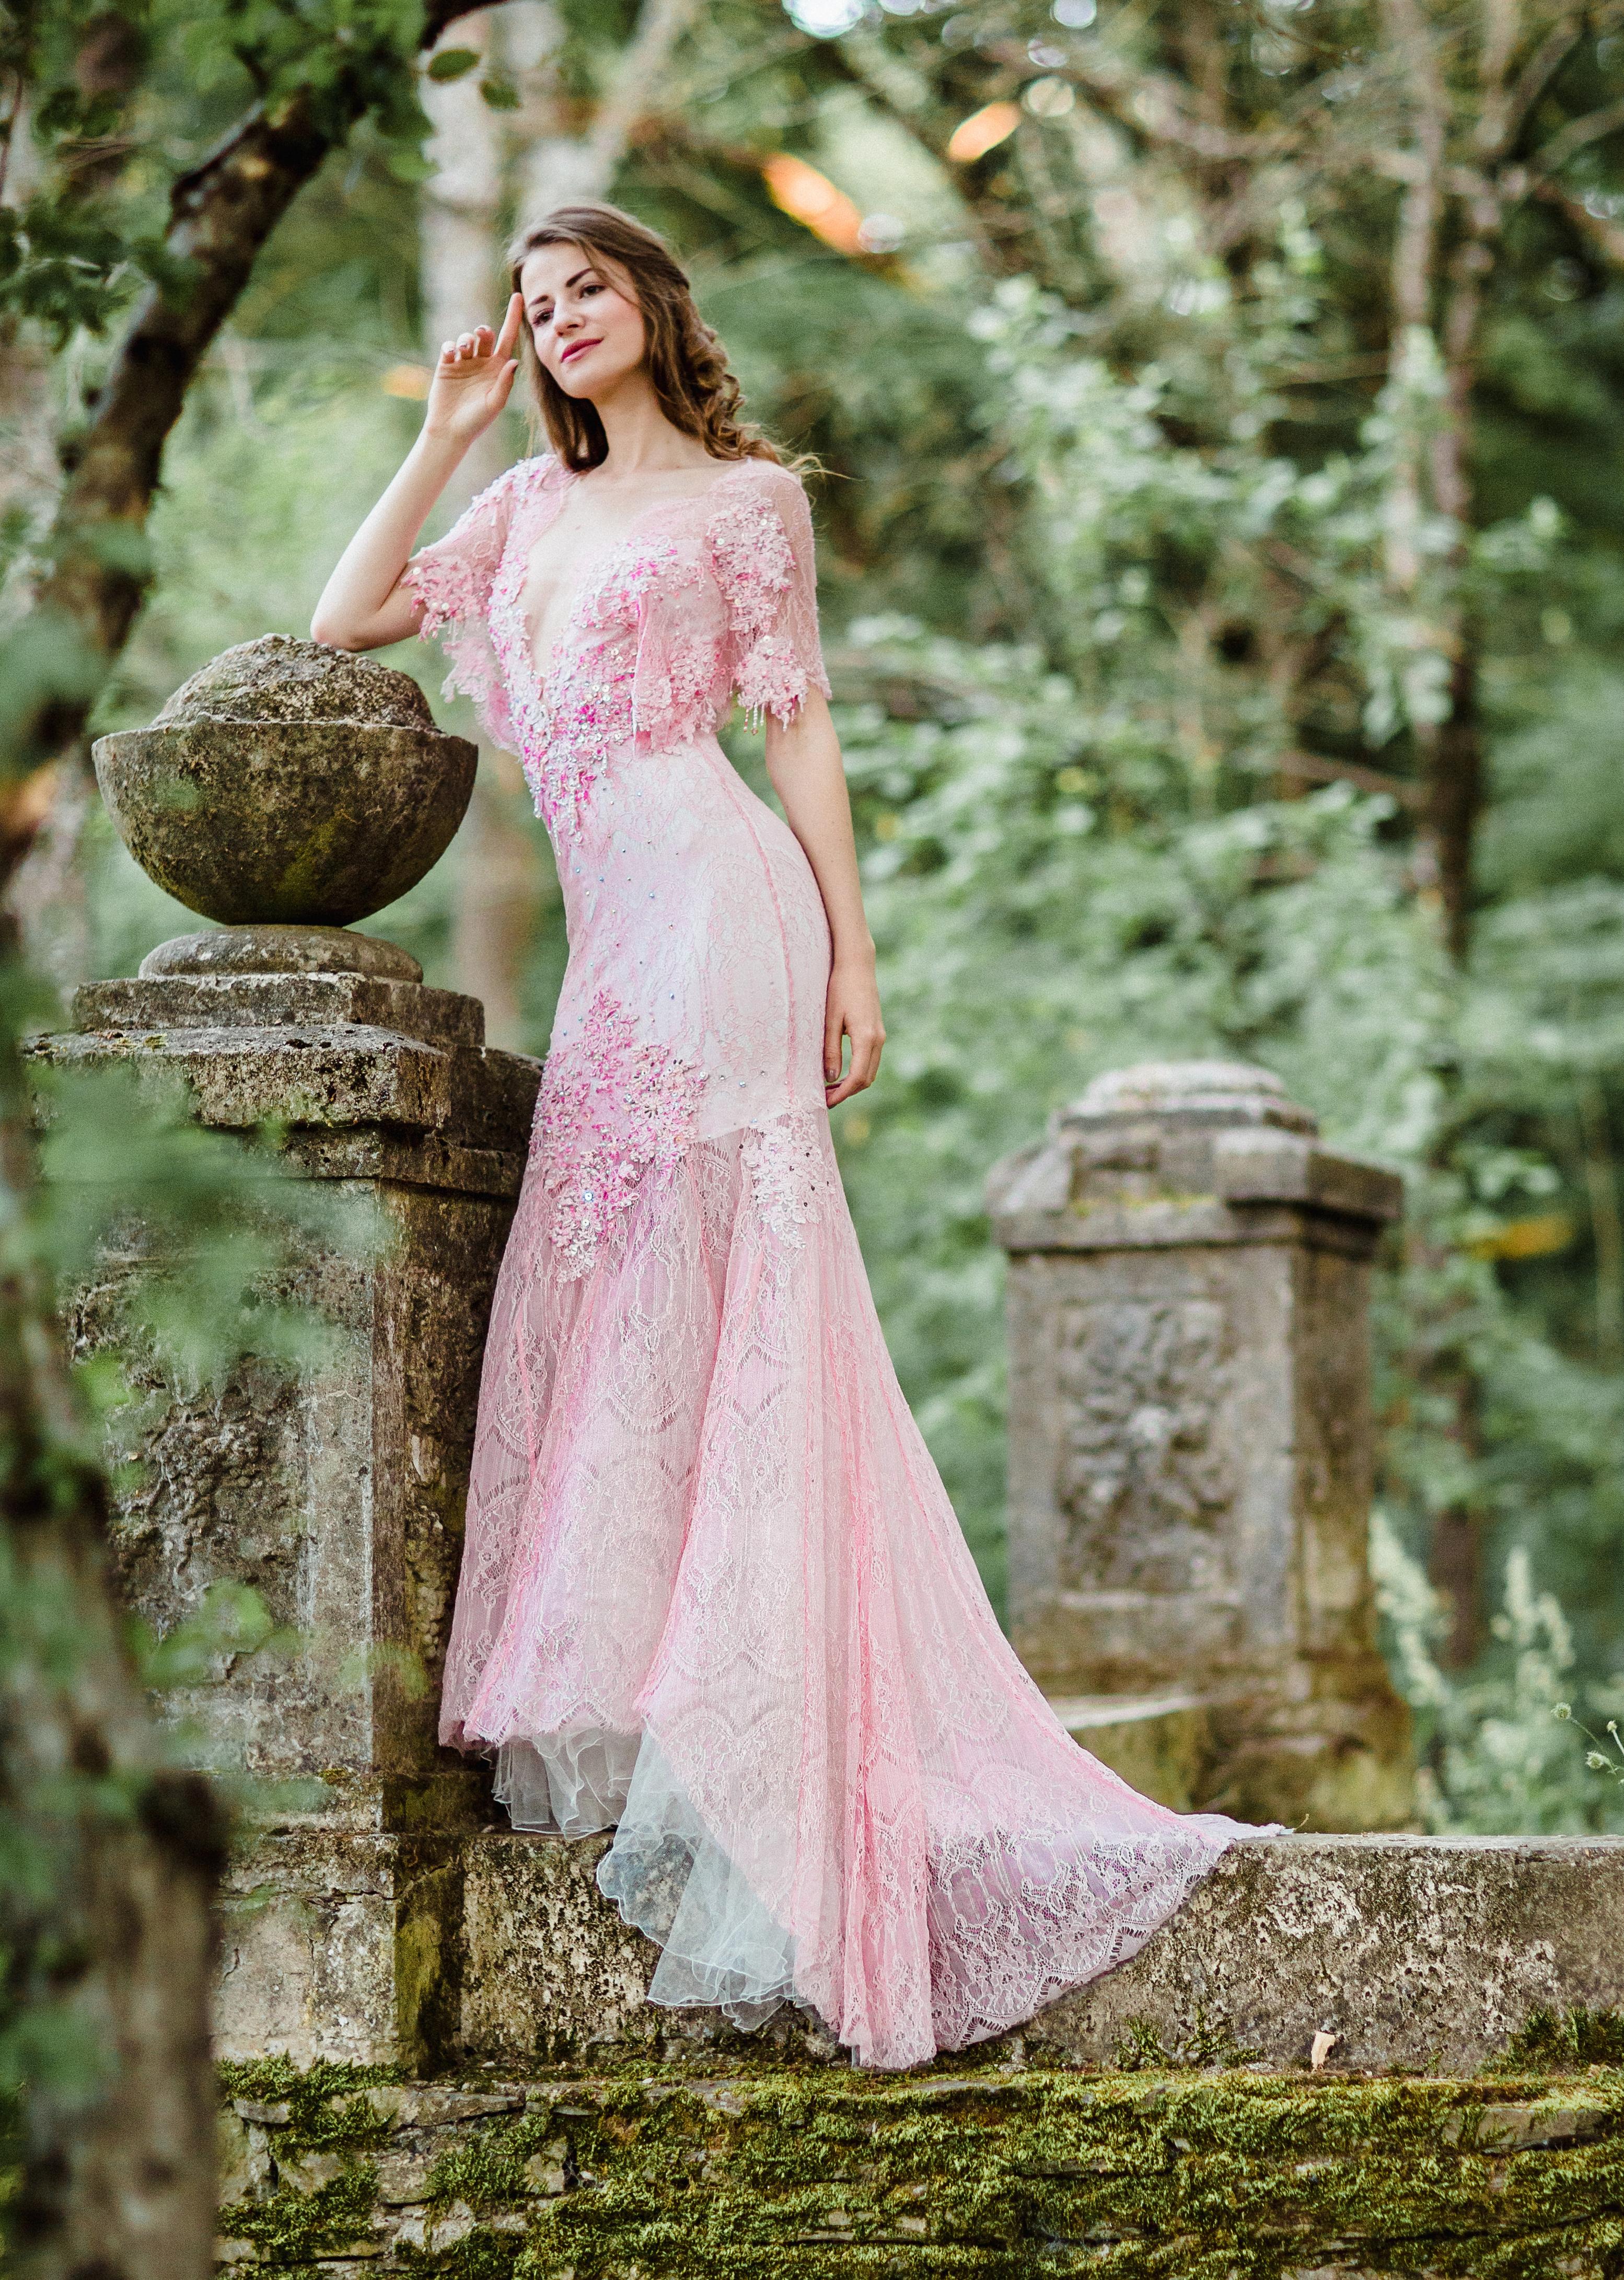 Airy light pink wedding dress anna skoblikova wedding dresses airy light pink wedding dress junglespirit Images